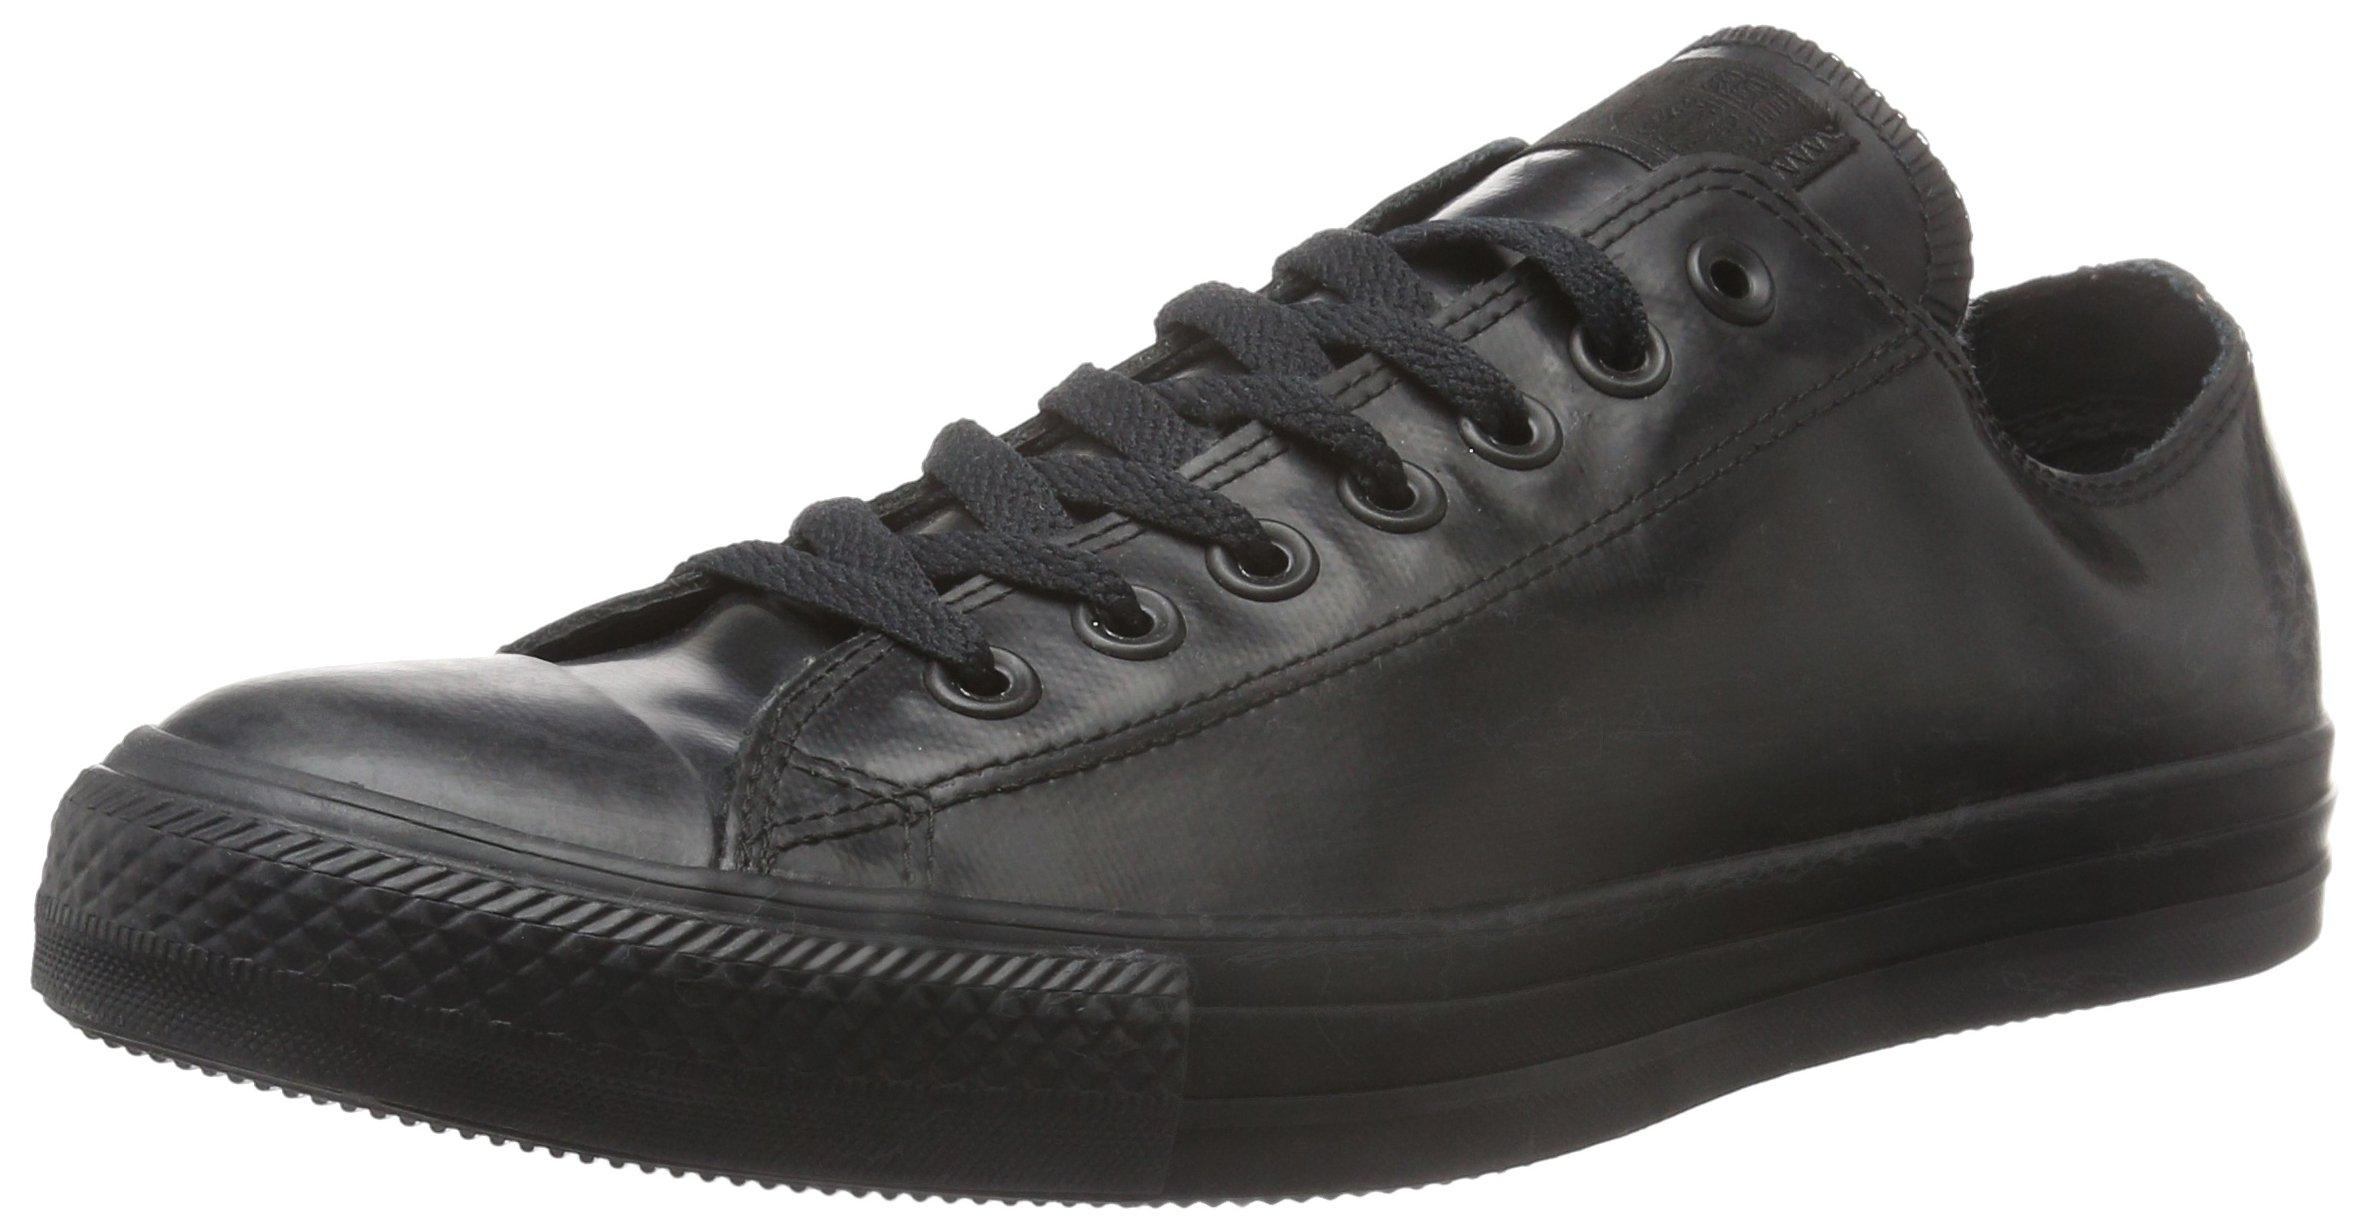 Converse Unisex Chuck Taylor All Star Ox Black/Black Basketball Shoe 11 Men US